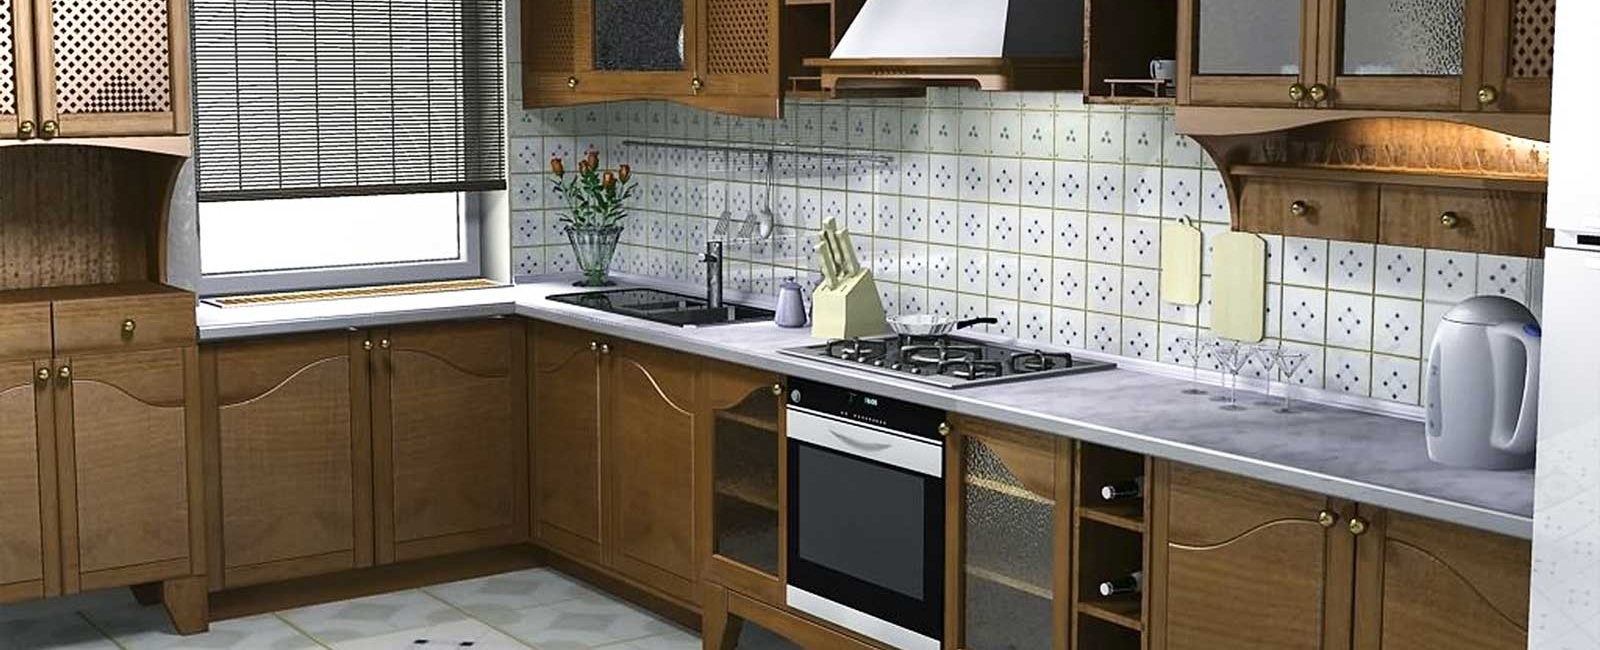 Popular Kitchen Layouts